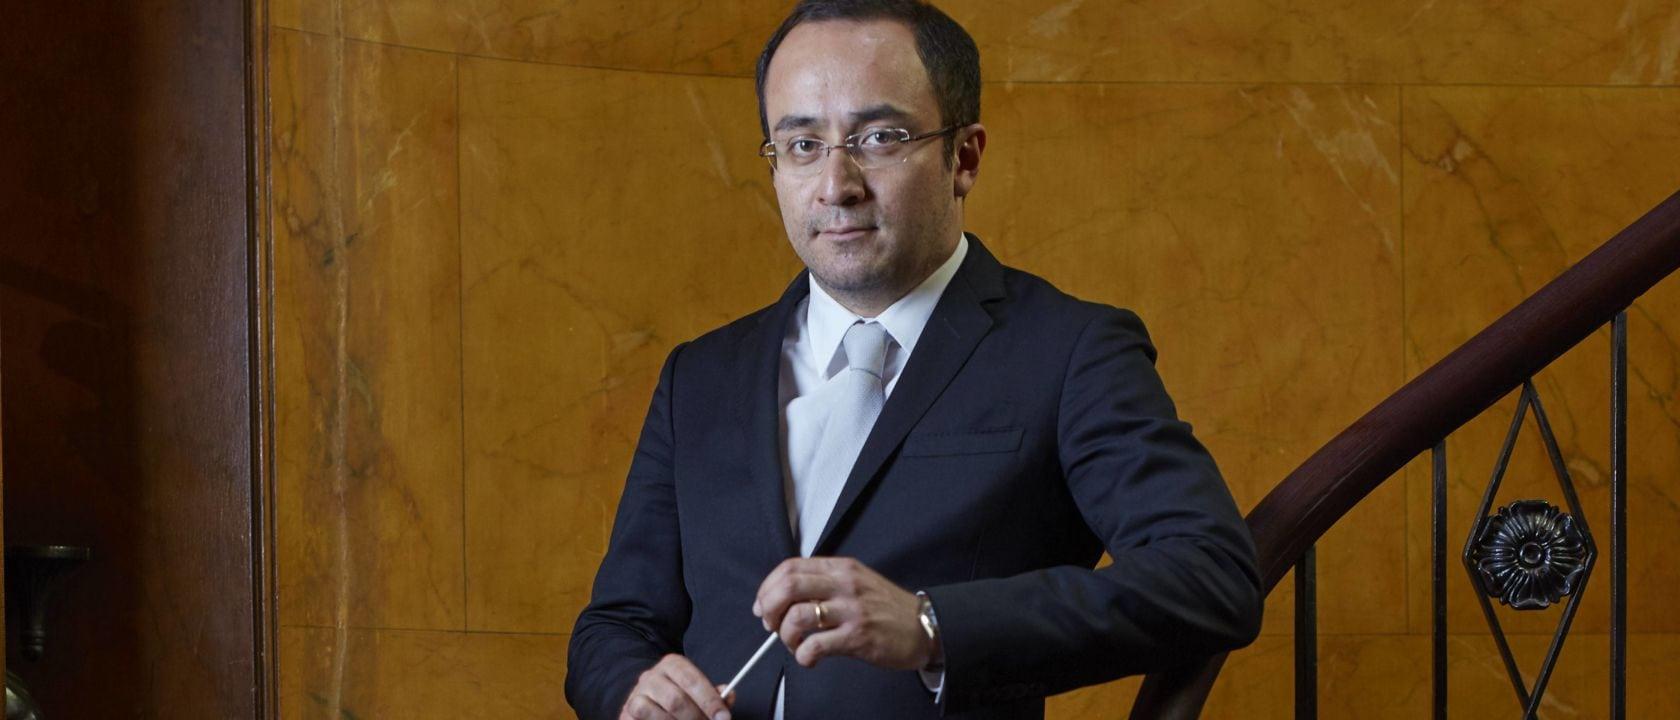 Riccardo Minasi Conductor